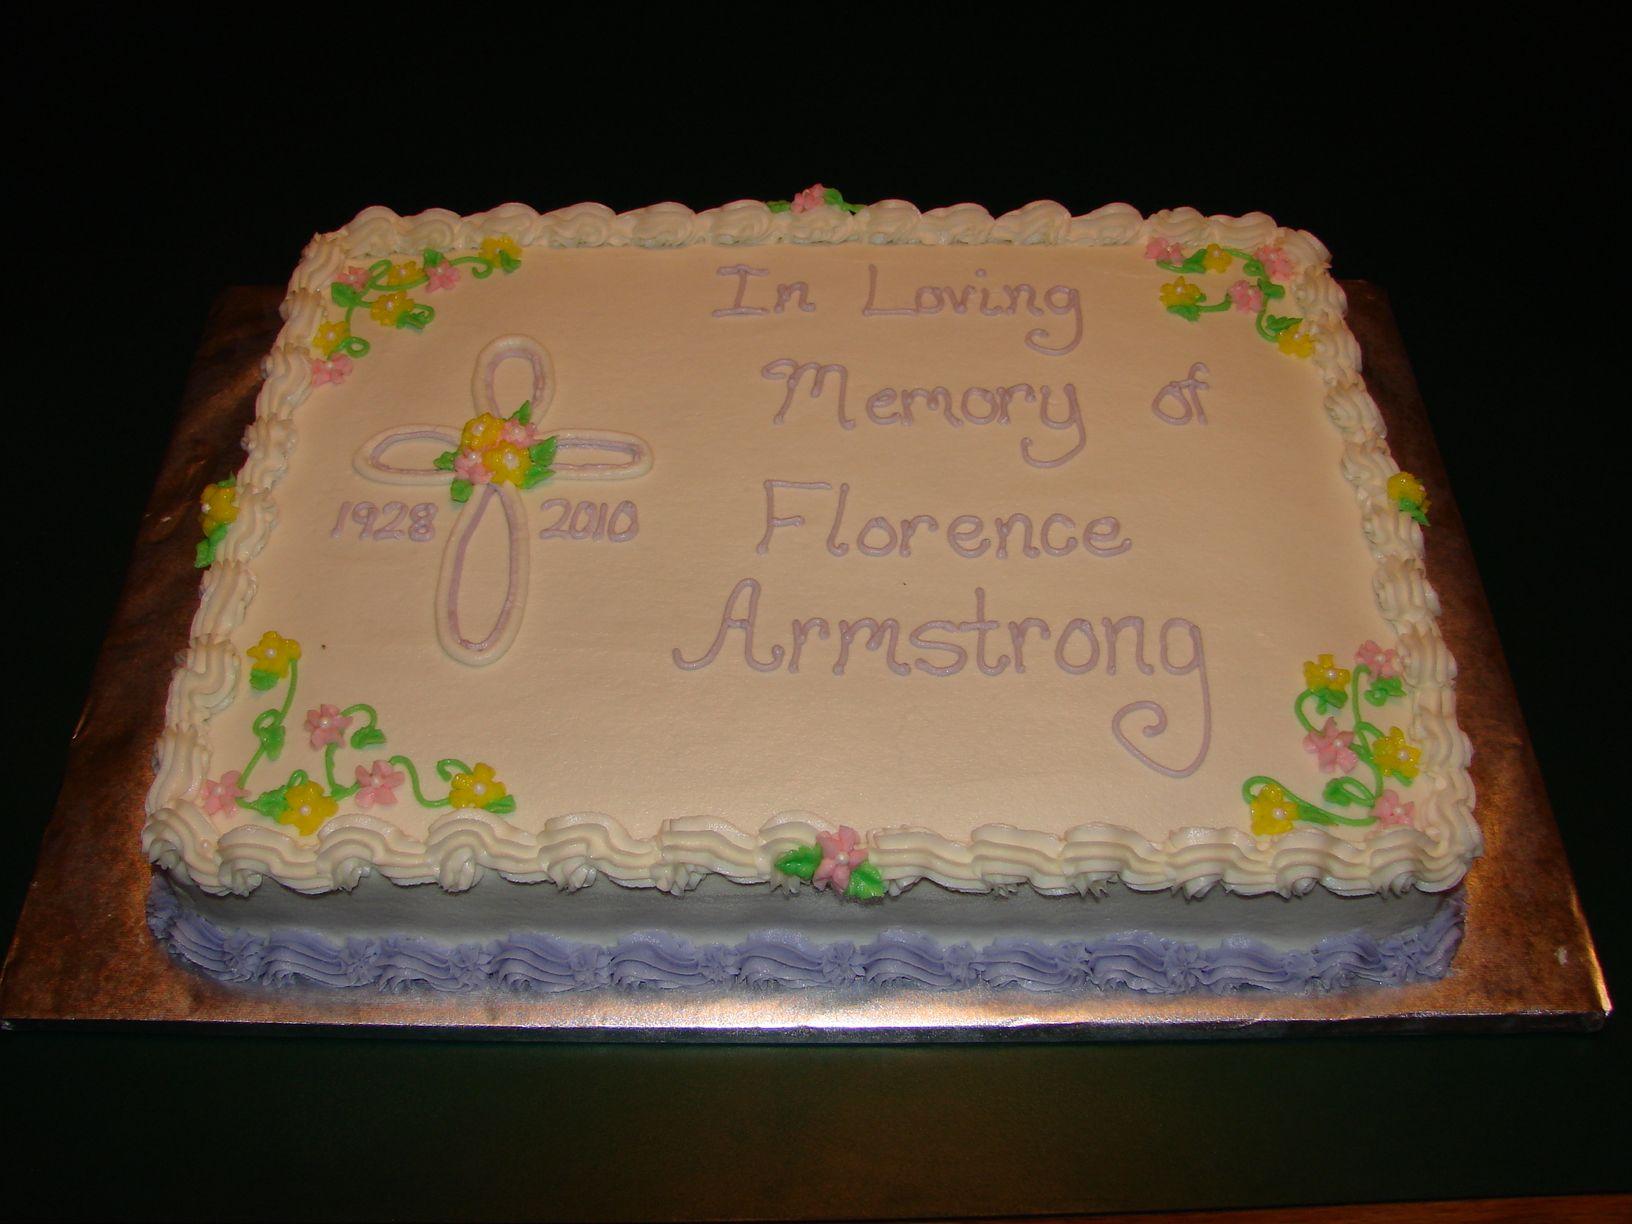 Memorial Service Cakes Google Search Cake Funeral Cake Cake